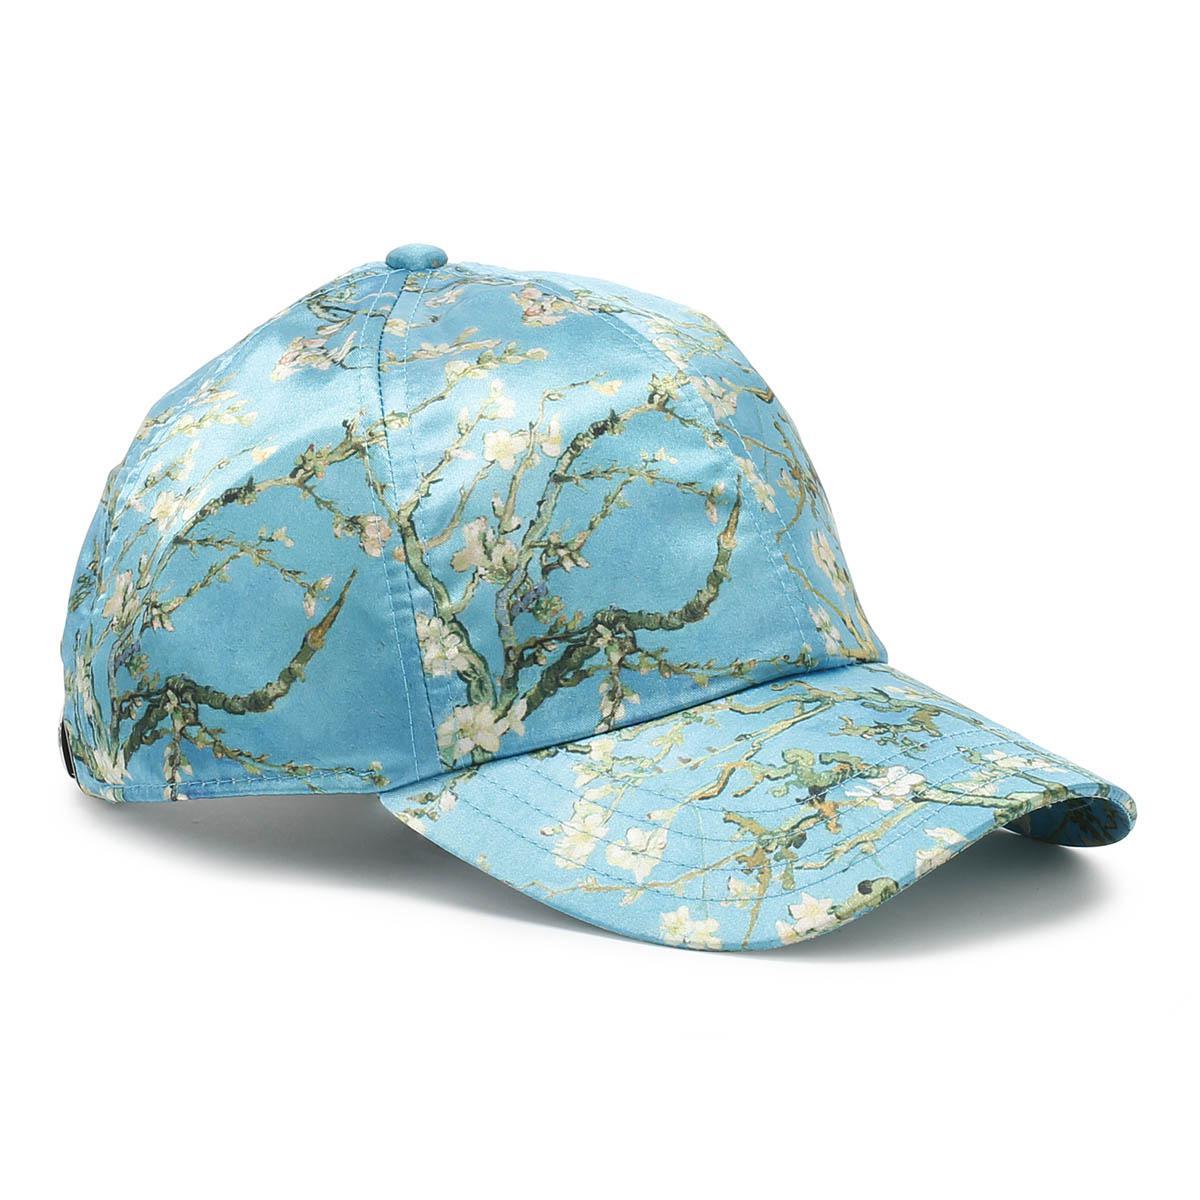 06abe3a2 Vans Van Gogh Almond Blossoms Blue Snapback Cap in Blue for Men - Lyst